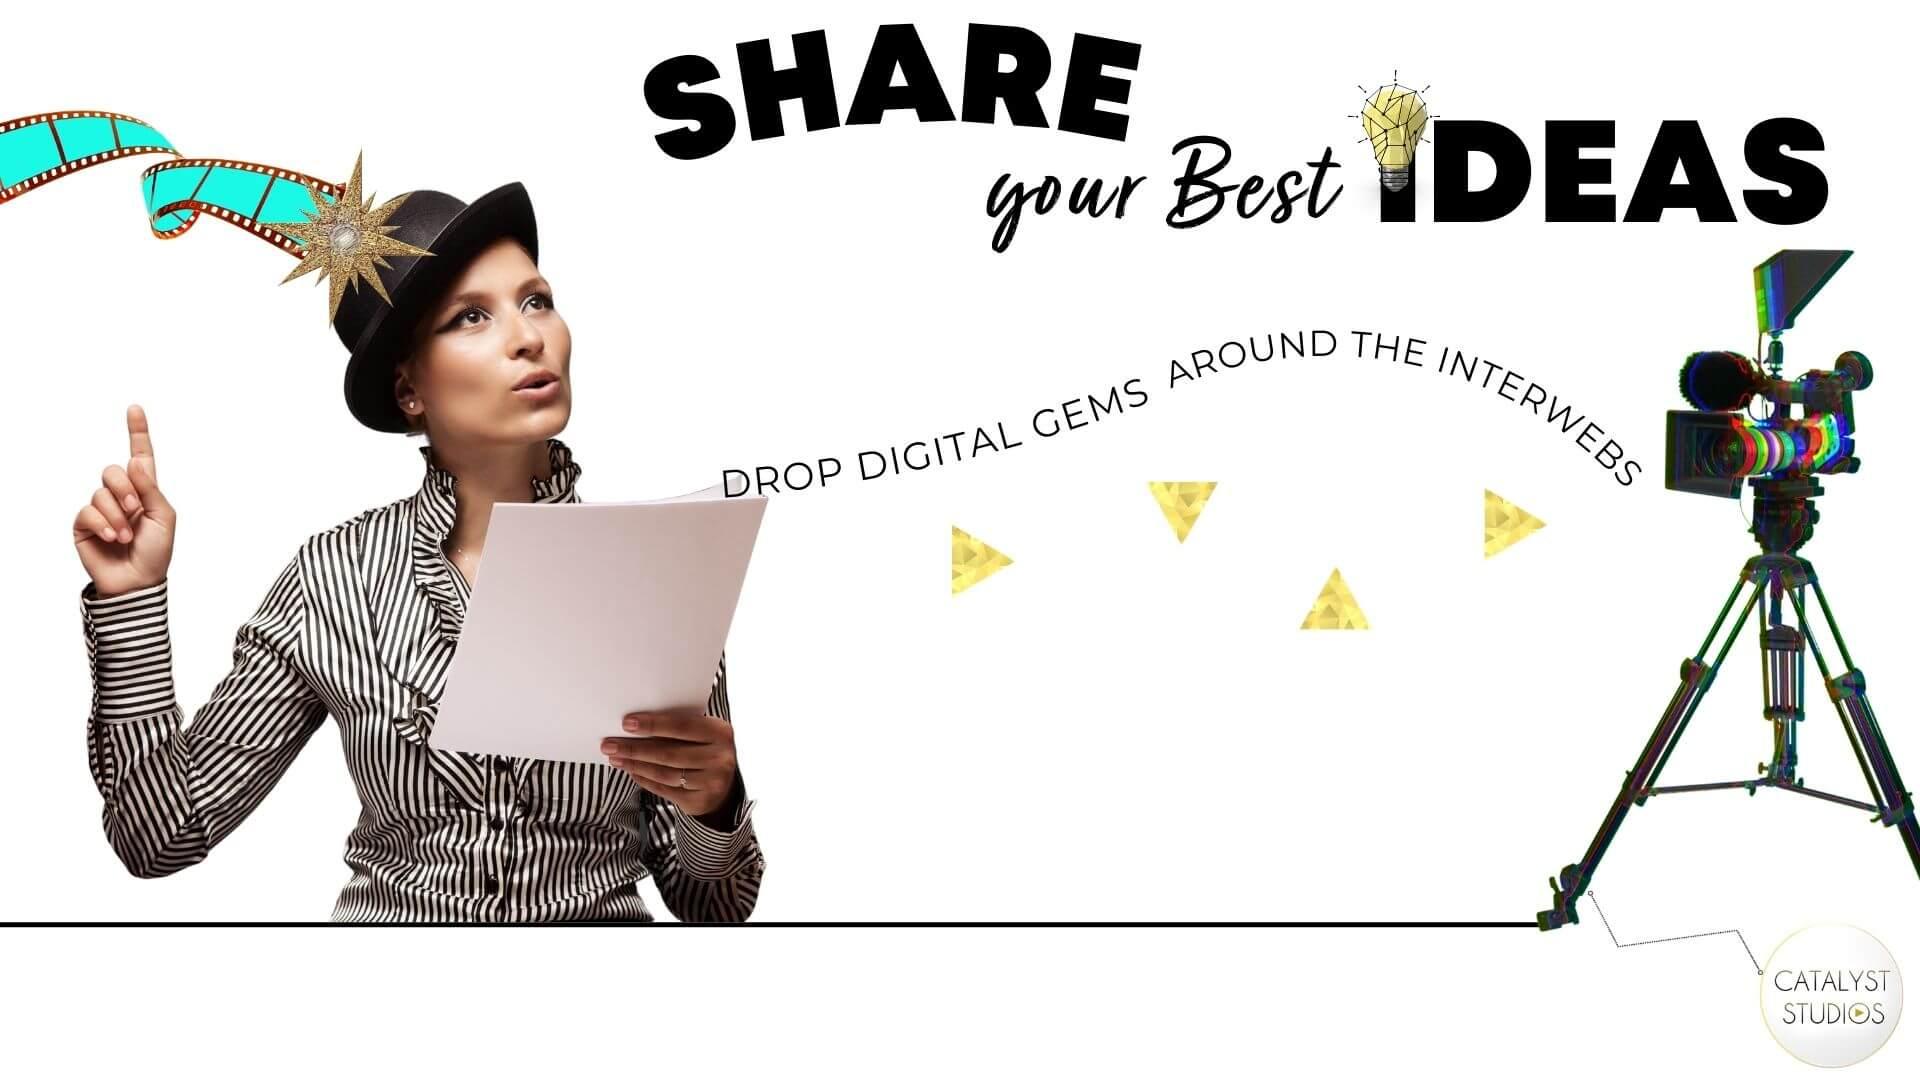 Drop Digital Gems-- Share your Best Ideas via Video -Catalyst Studios